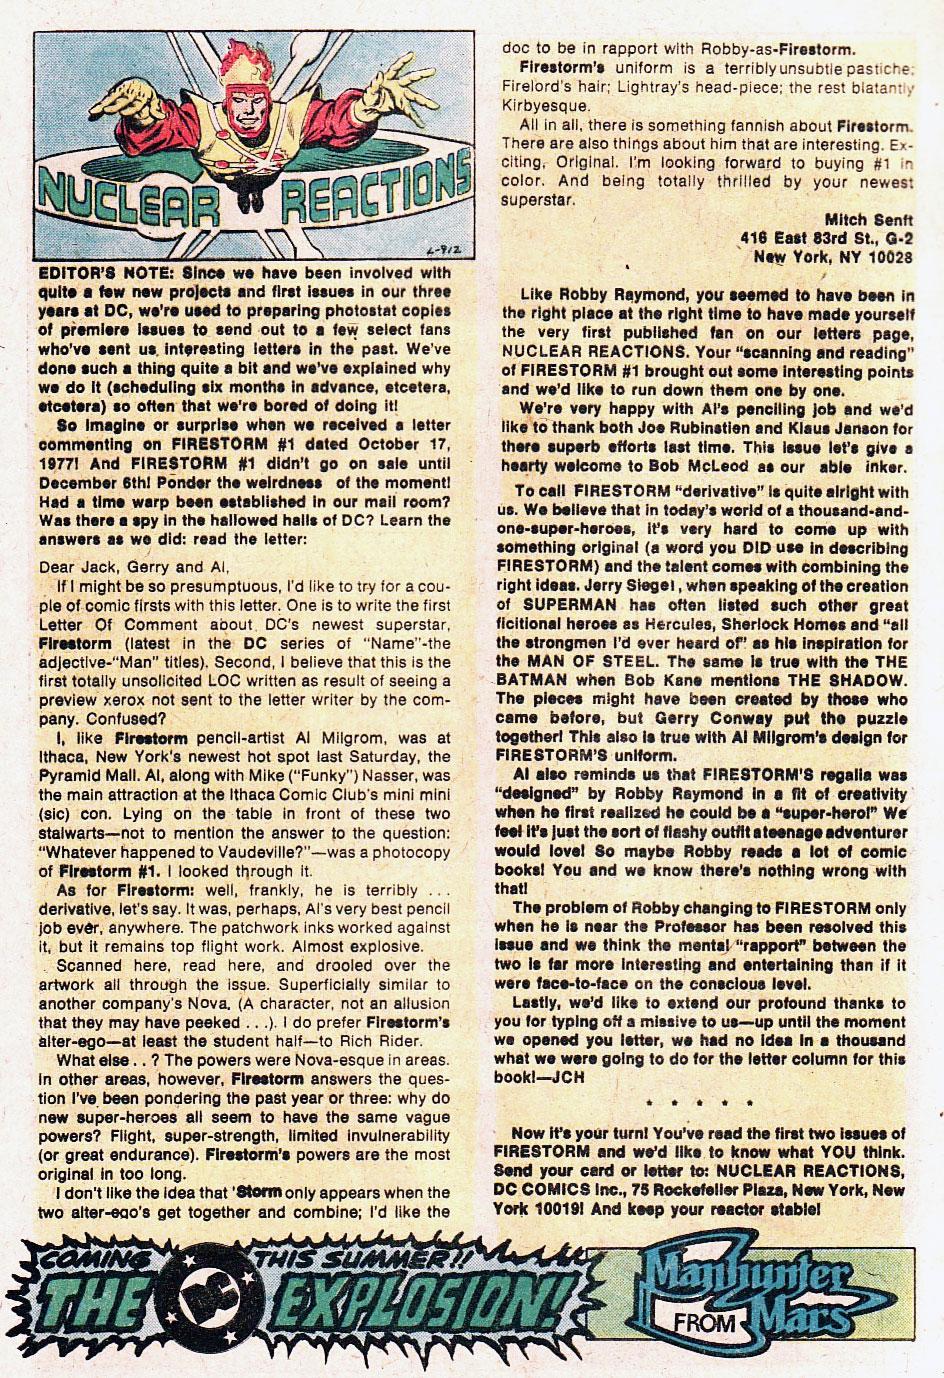 Firestorm #2 letter column featuring Robby Raymond